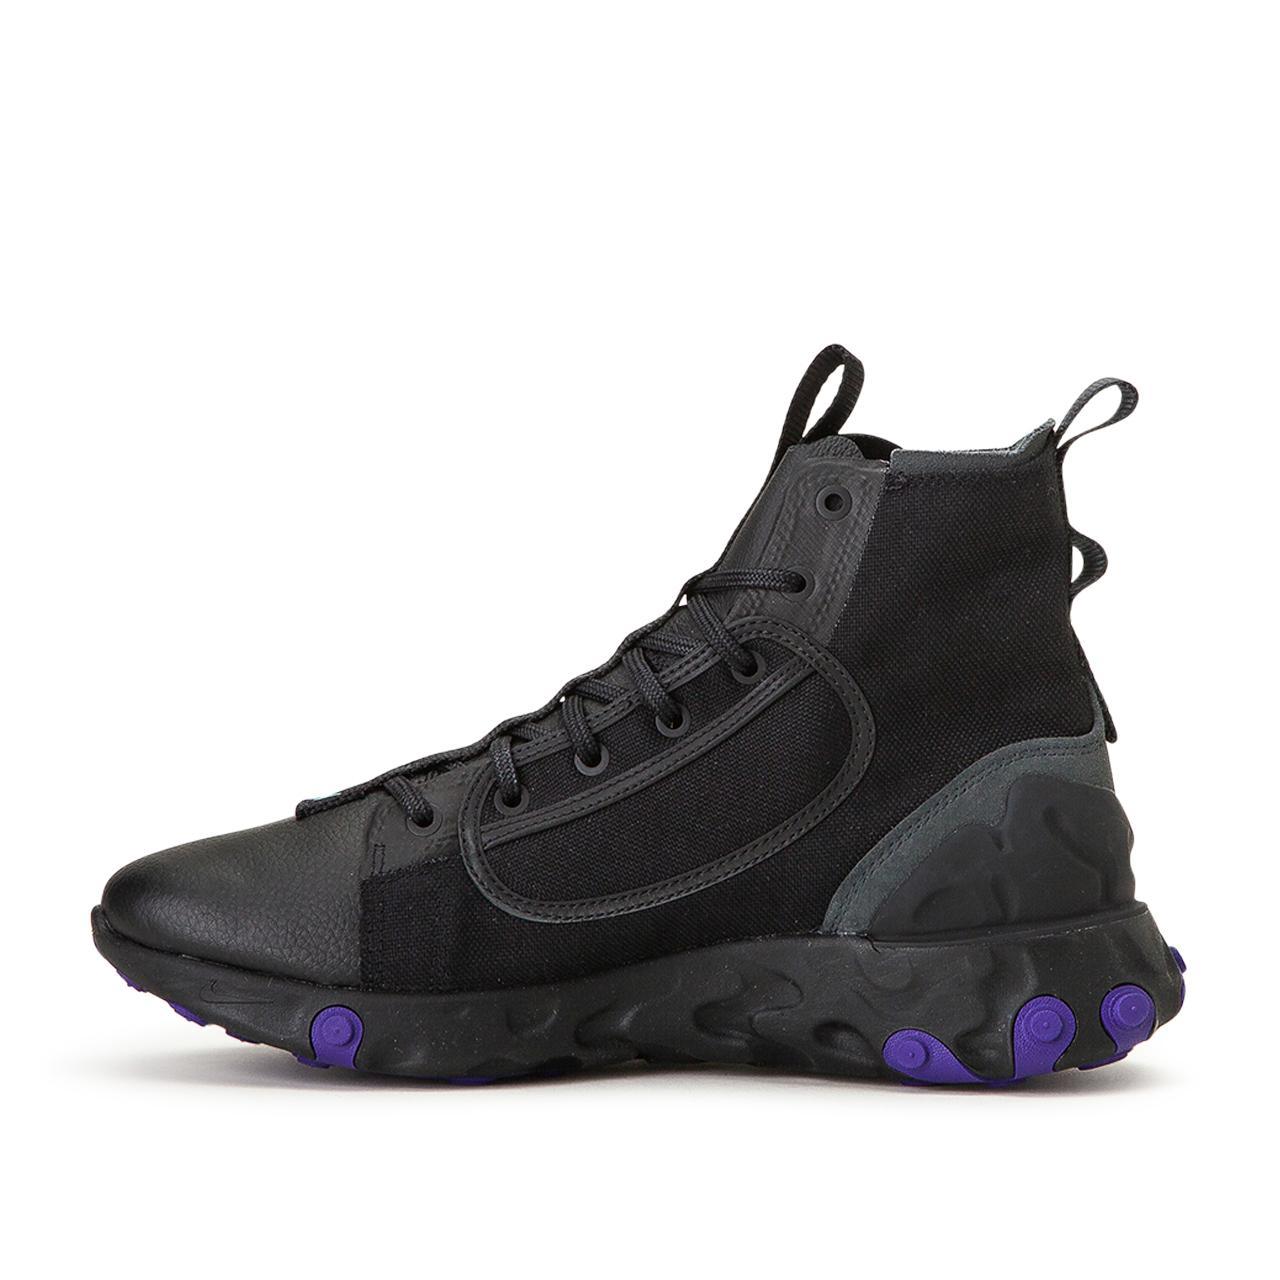 Nike React Ianga Shoe in Black for Men - Lyst